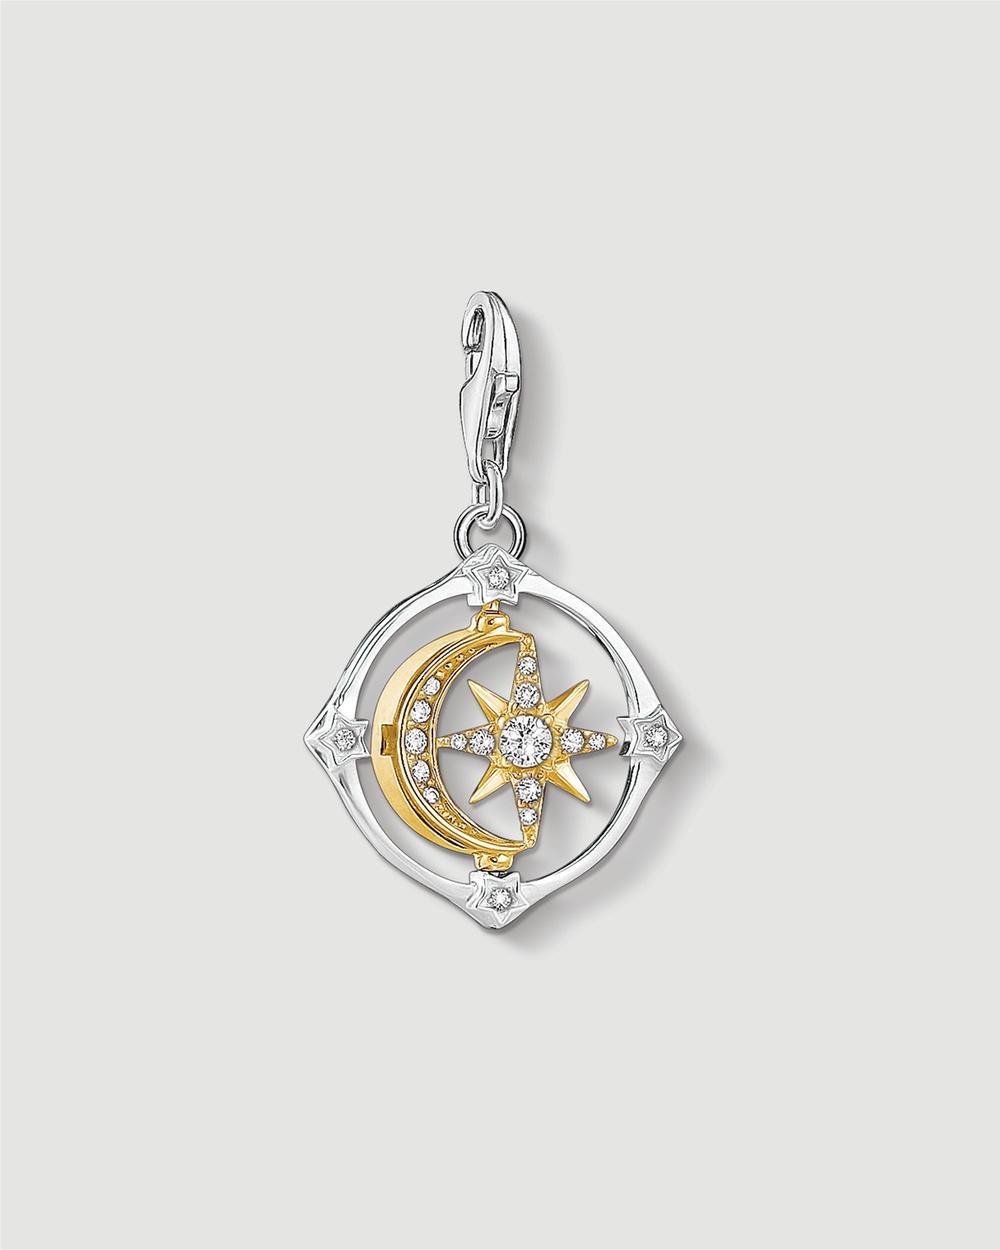 THOMAS SABO Moveable Moon & Star Charm Pendant Jewellery Multicoloured